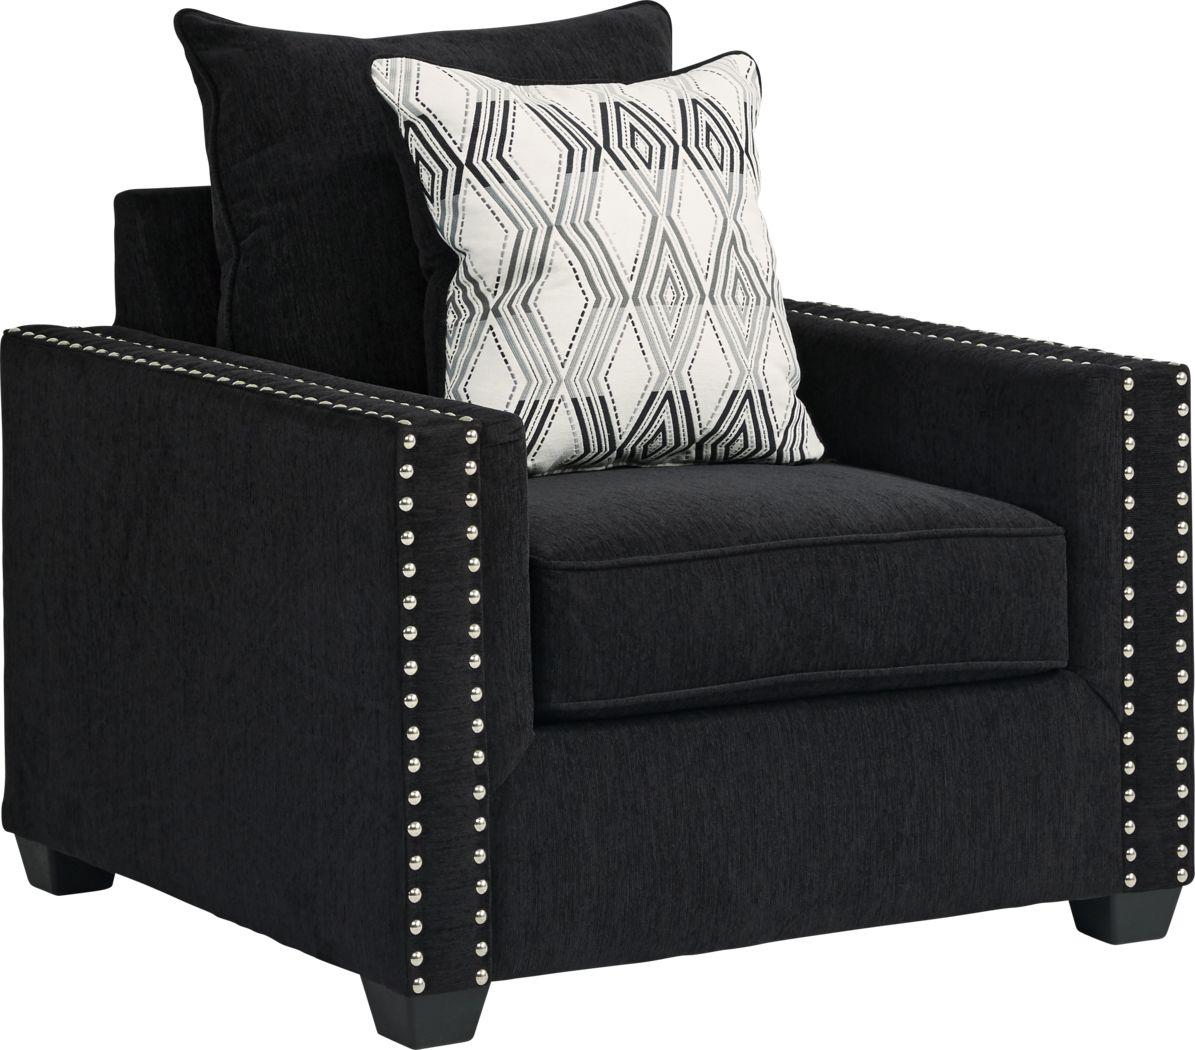 Natalia Black Chair